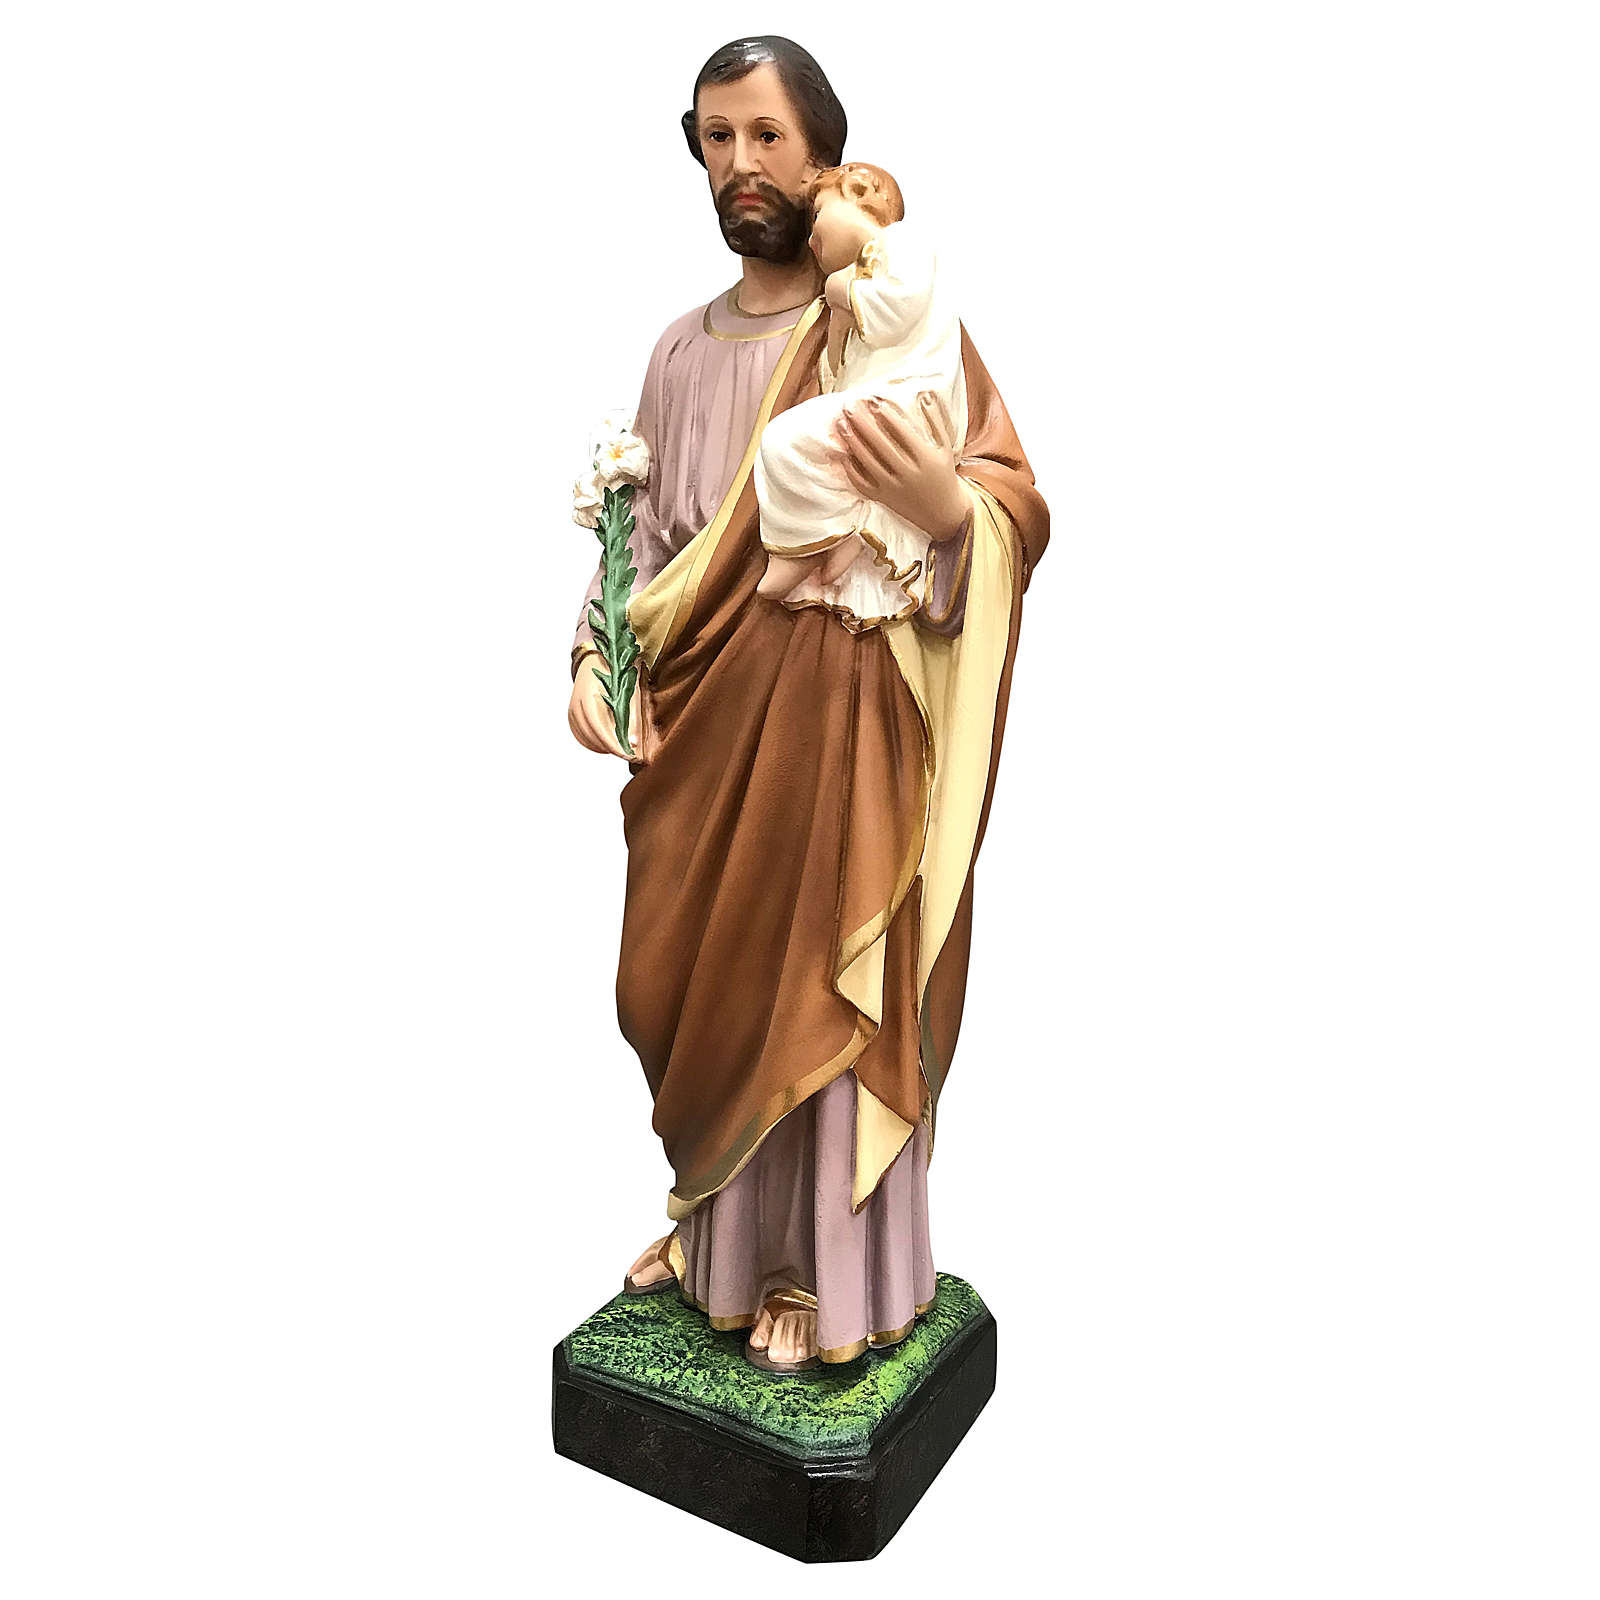 Statua San Giuseppe 50 cm vetroresina colorata 4